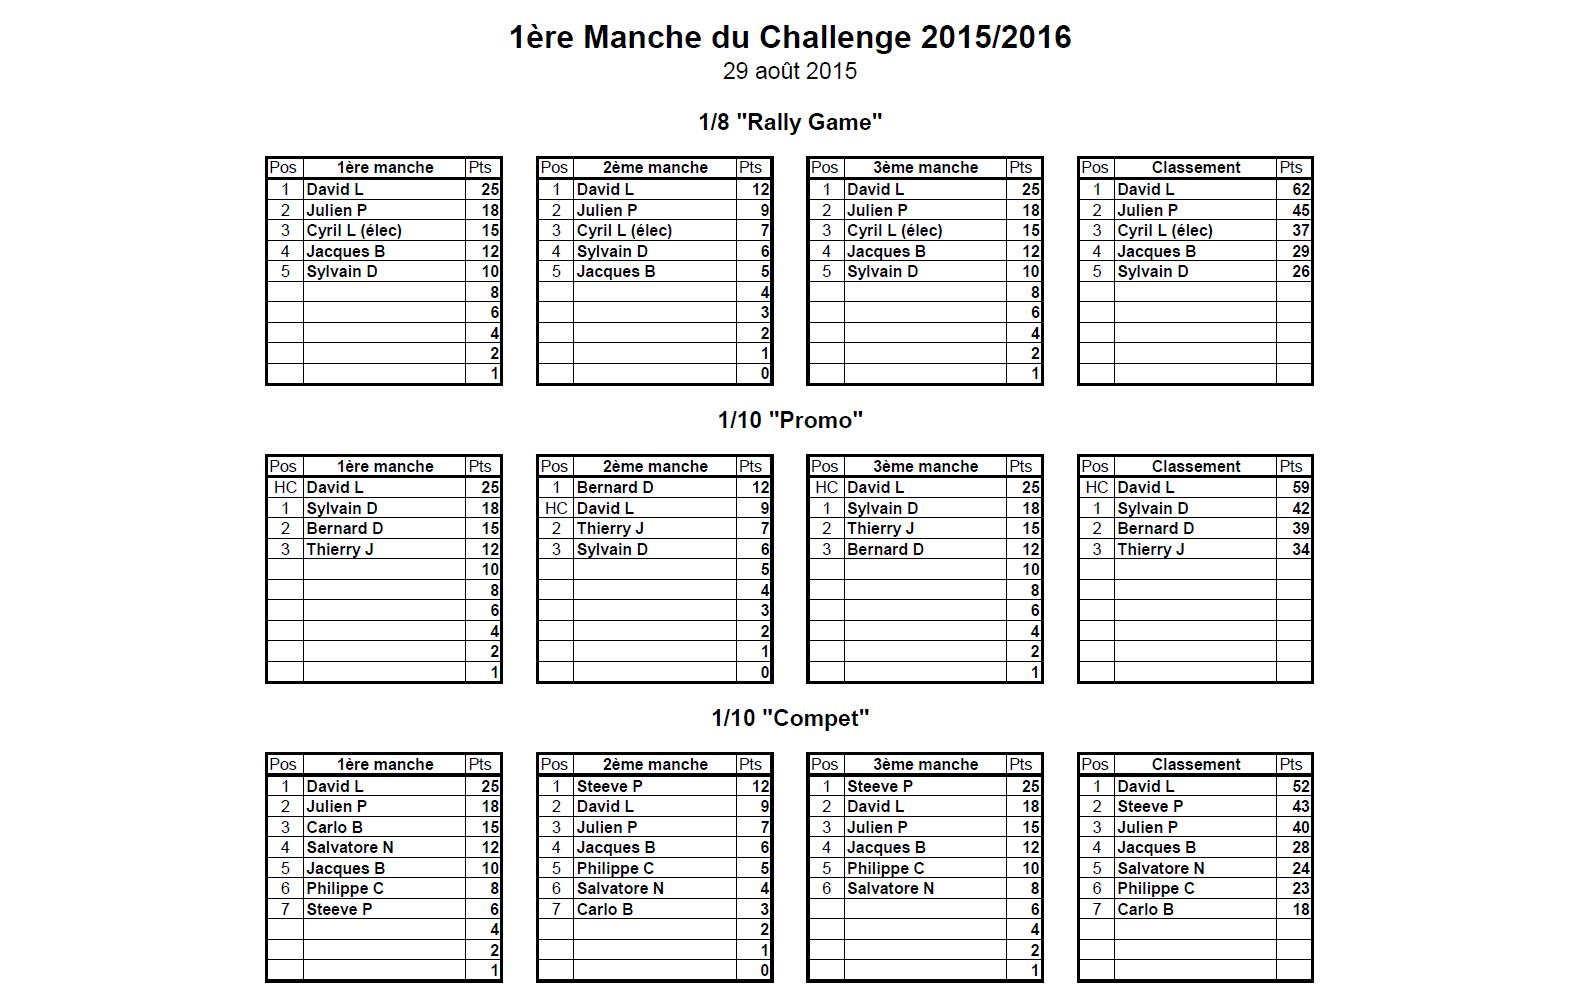 Classement 1er miniGP 2015-2016